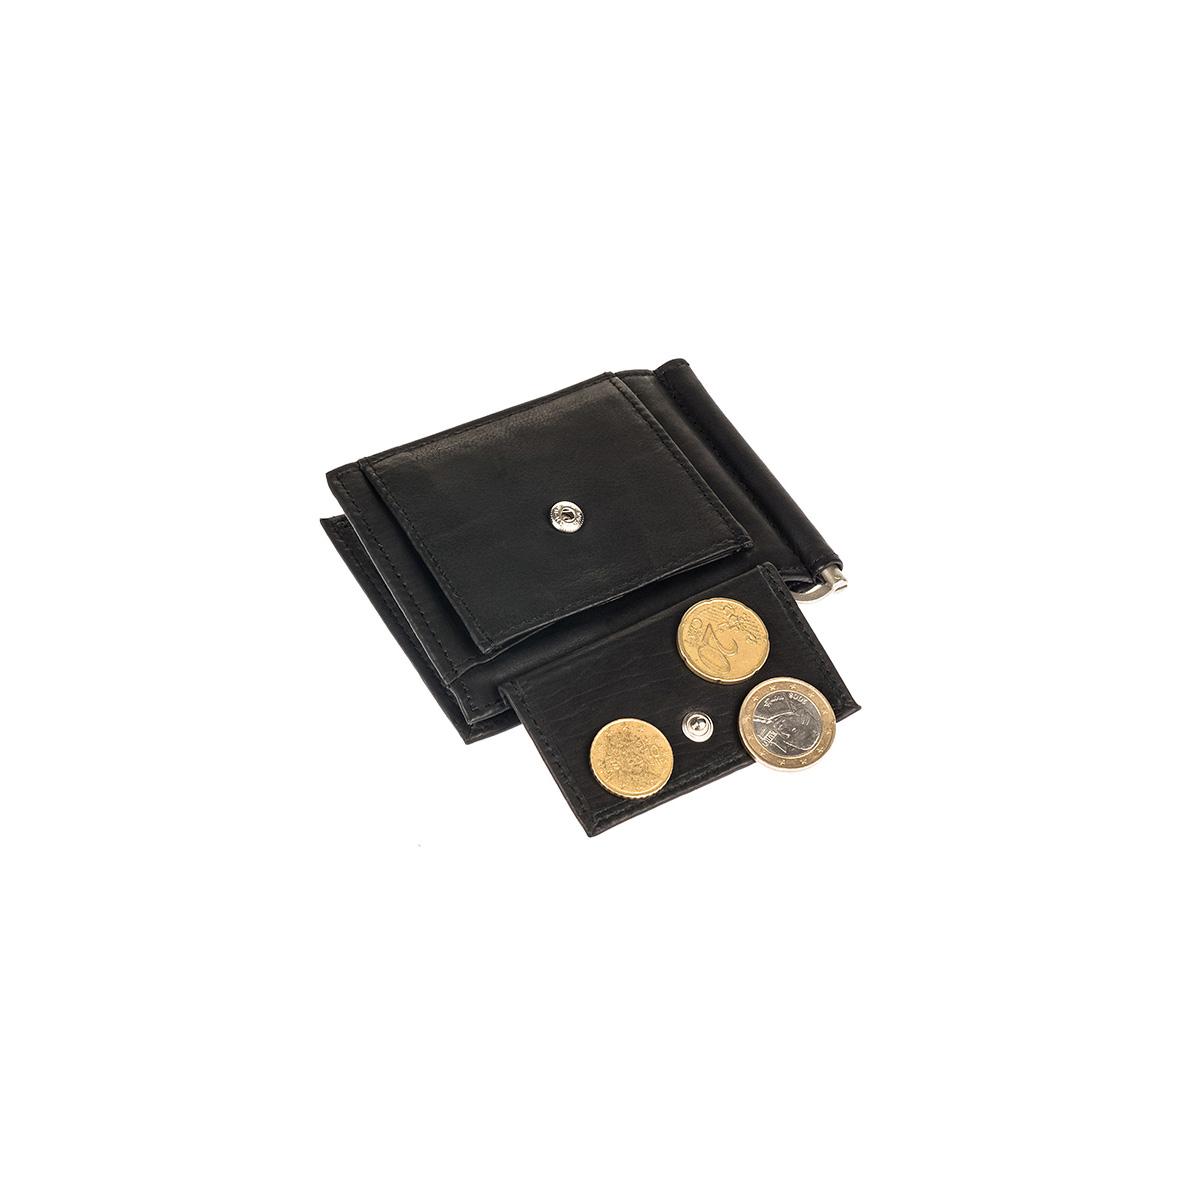 64897f707a Δερμάτινο Πορτοφόλι Με Κλιπ-Έλασμα Χρημάτων BB 38 Μαύρο